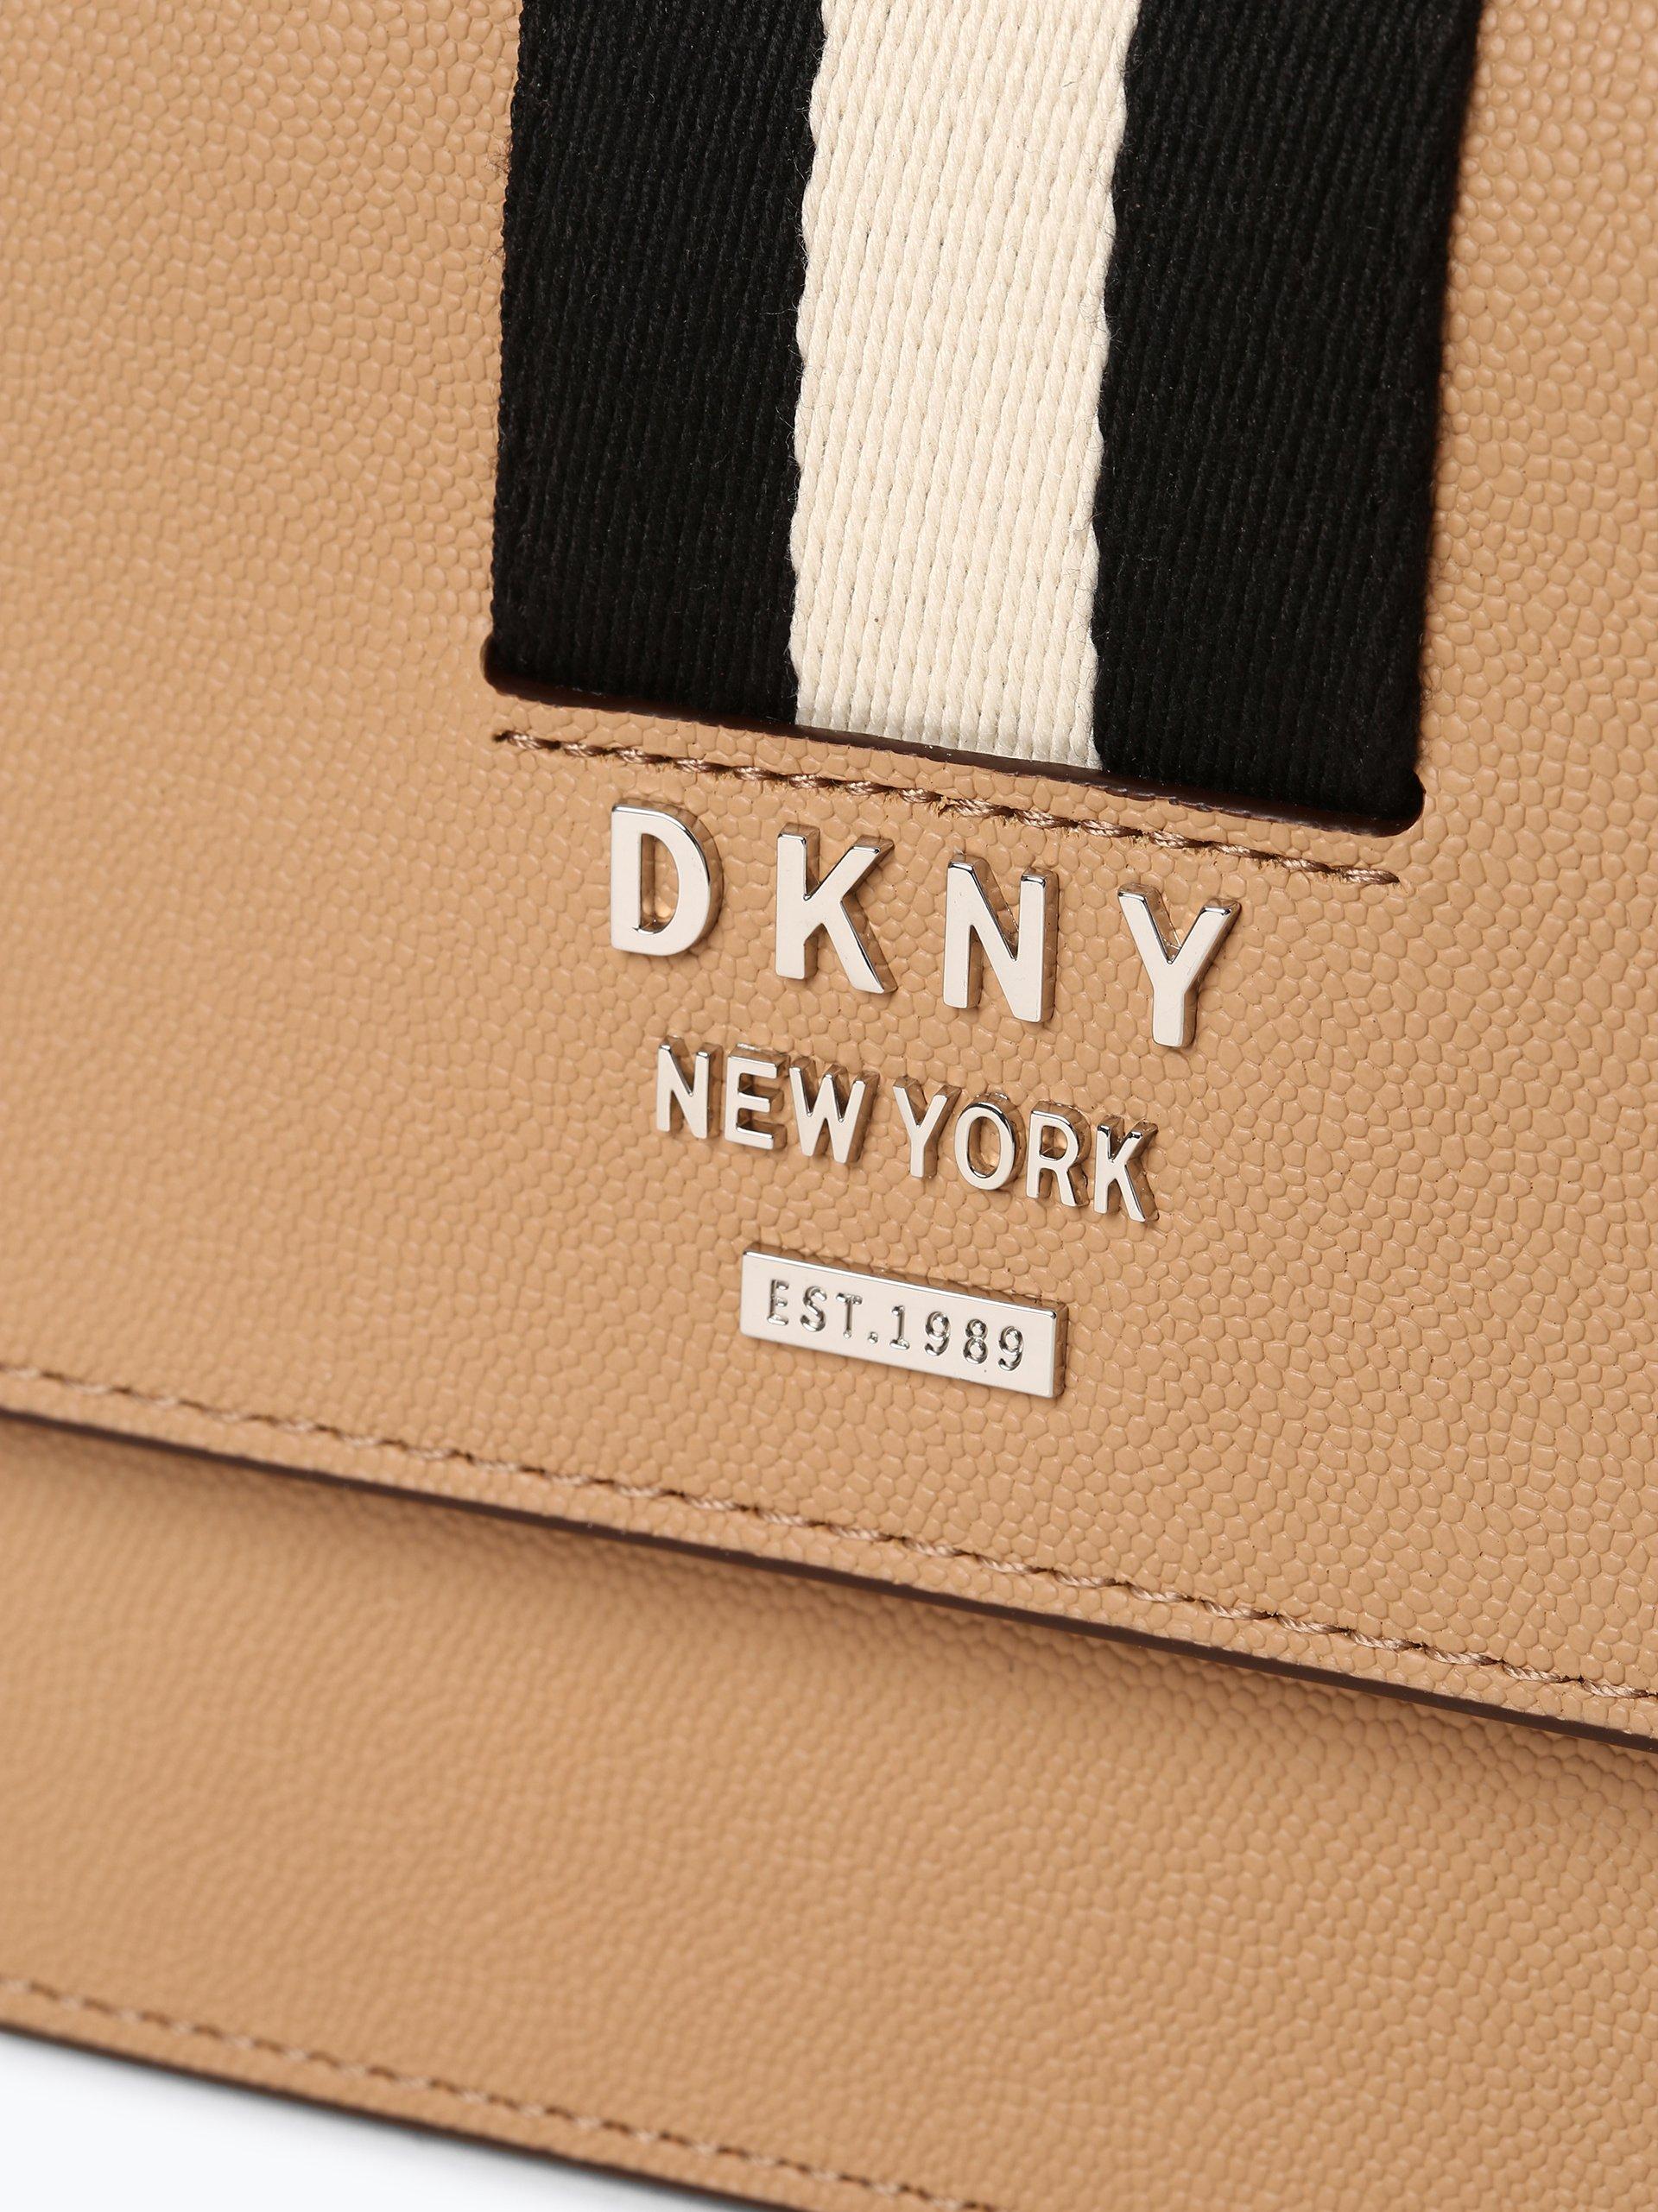 DKNY Damen Umhängetasche aus Leder